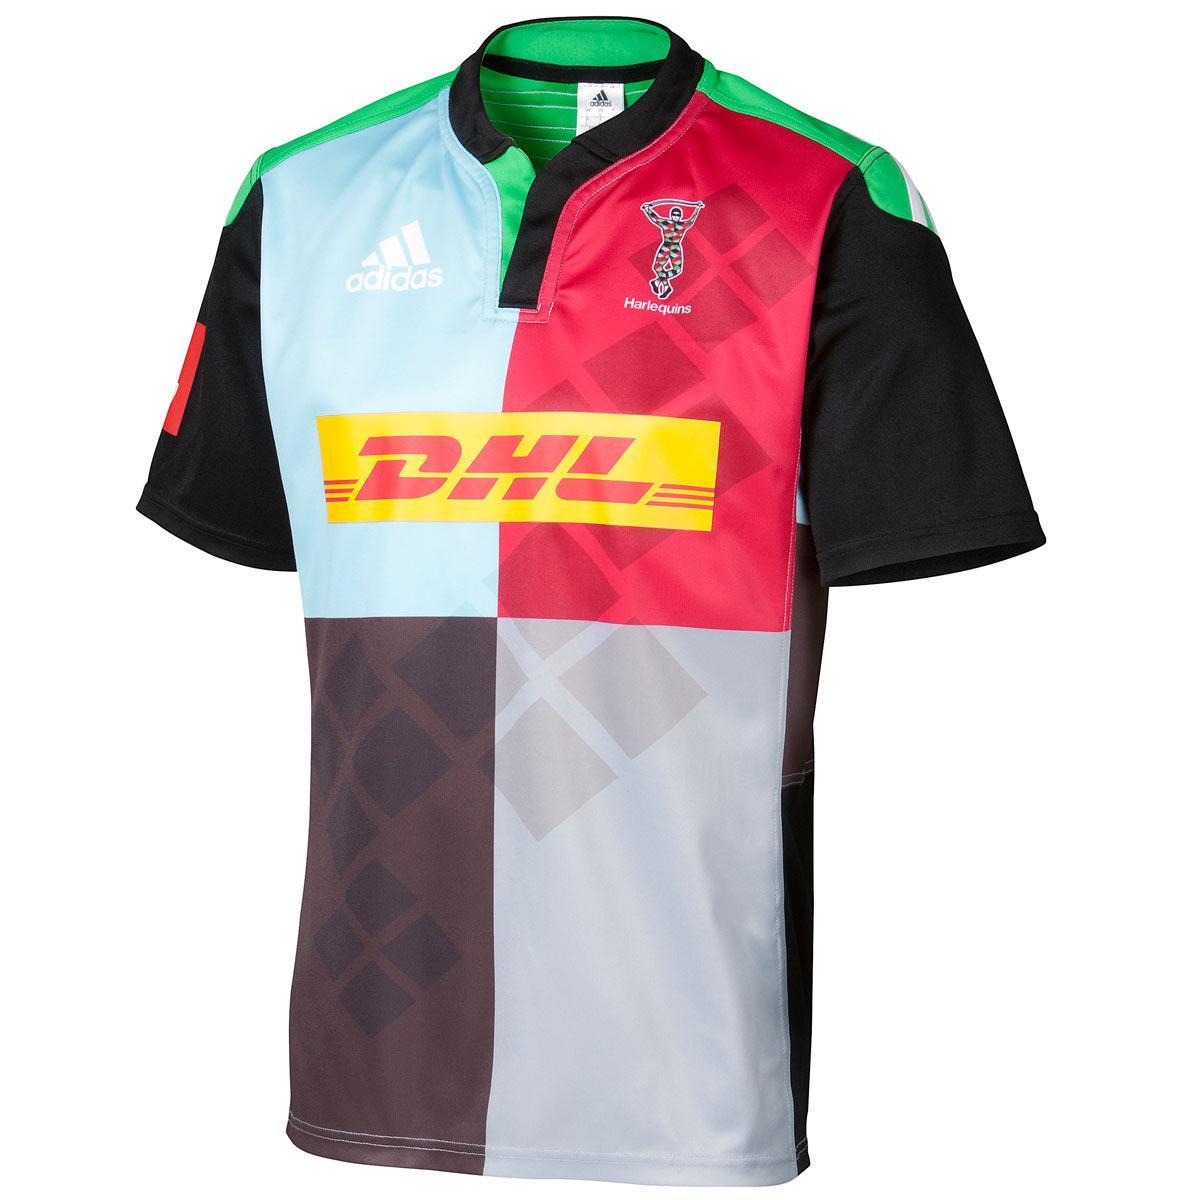 287205b29b9 Harlequins 2014/15 Adidas Home & Alternate Shirts – Rugby Shirt Watch